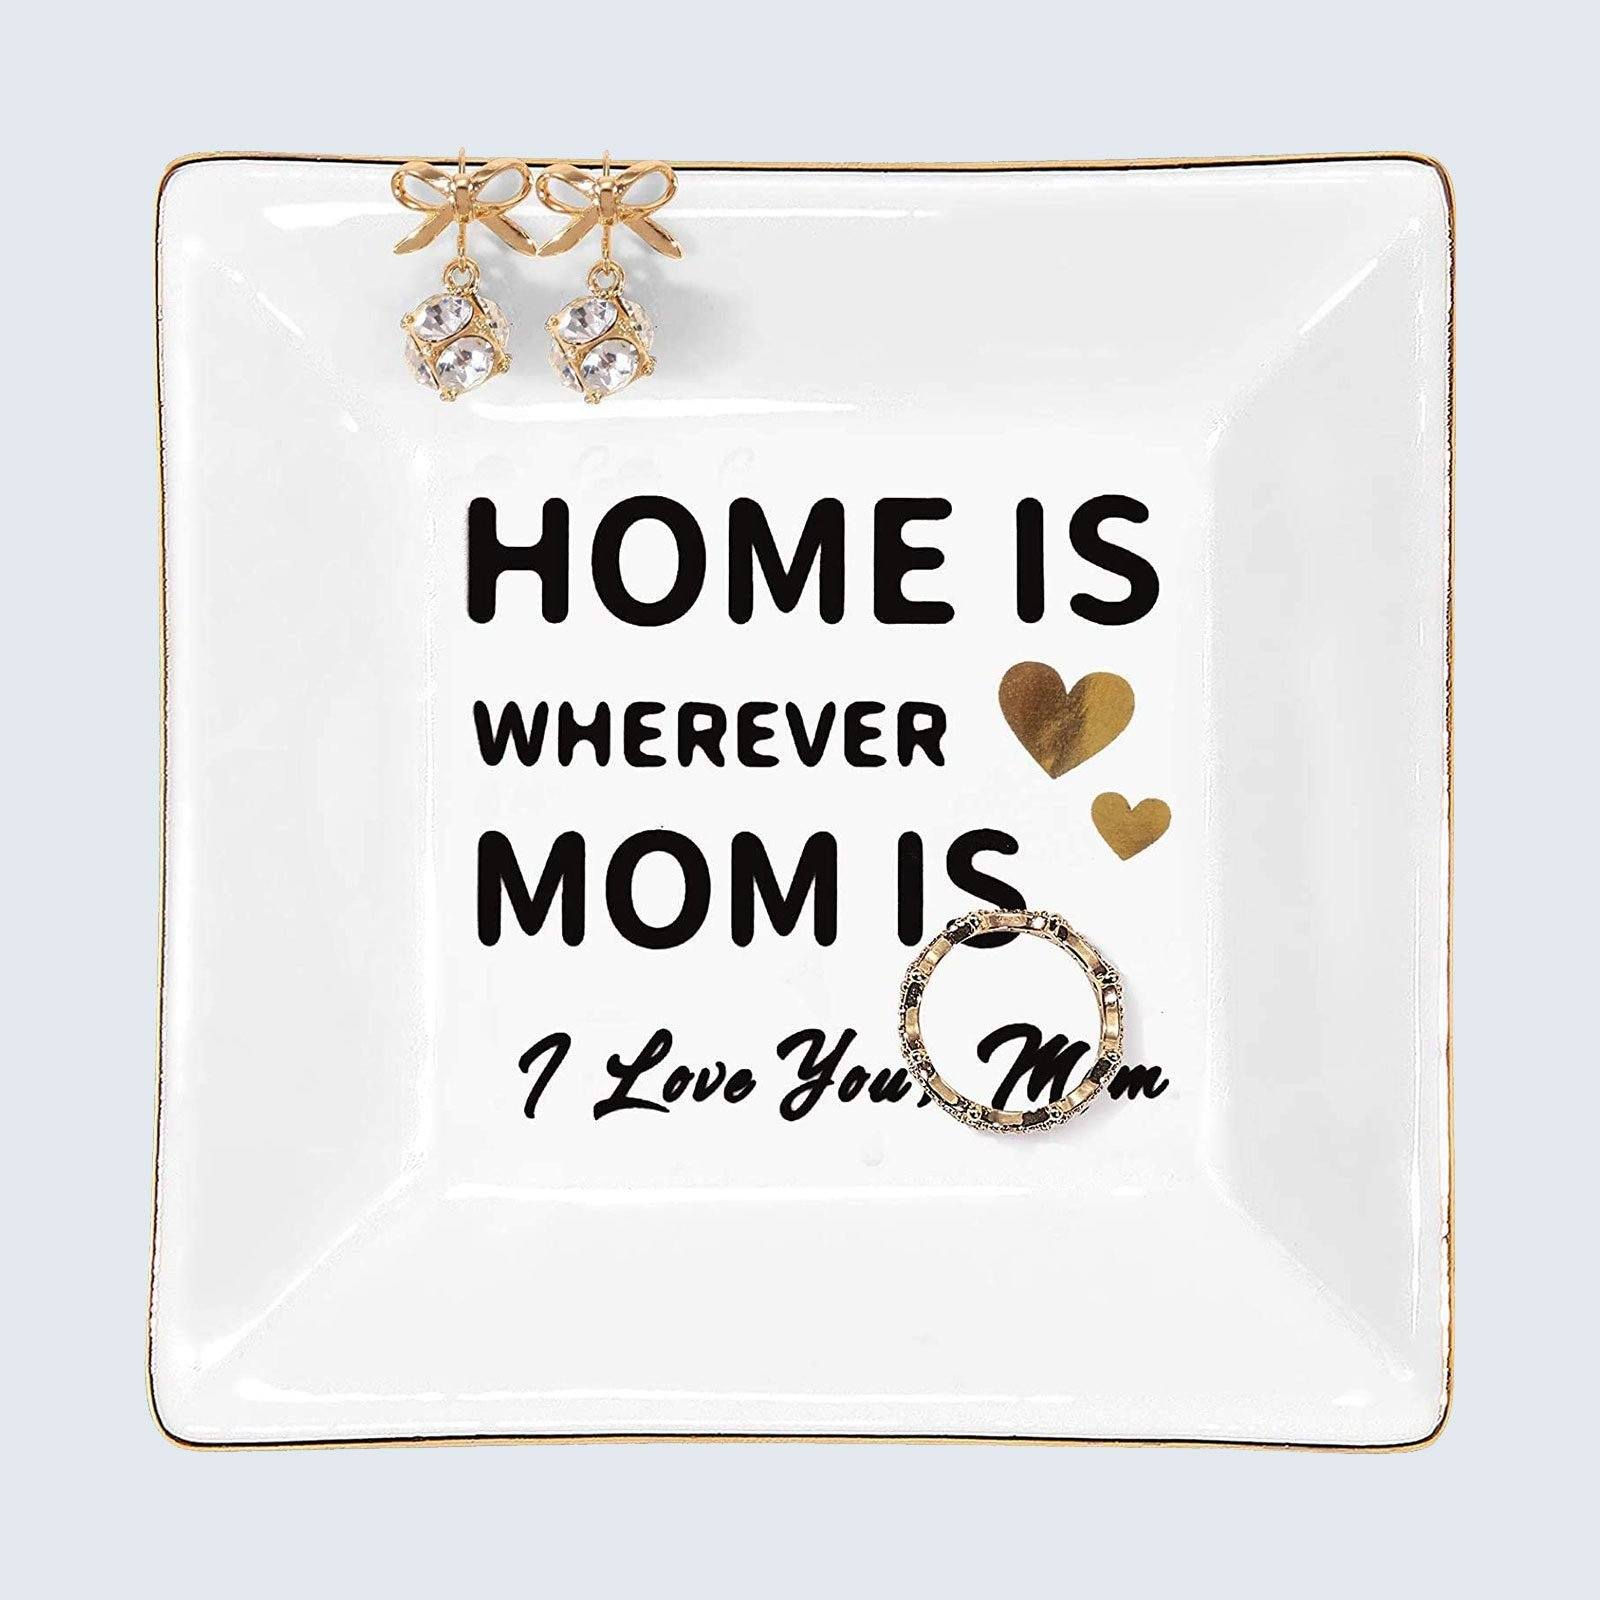 For the mom who loves daily affirmations: Kaidouma Ceramic Jewelry Trinket Tray